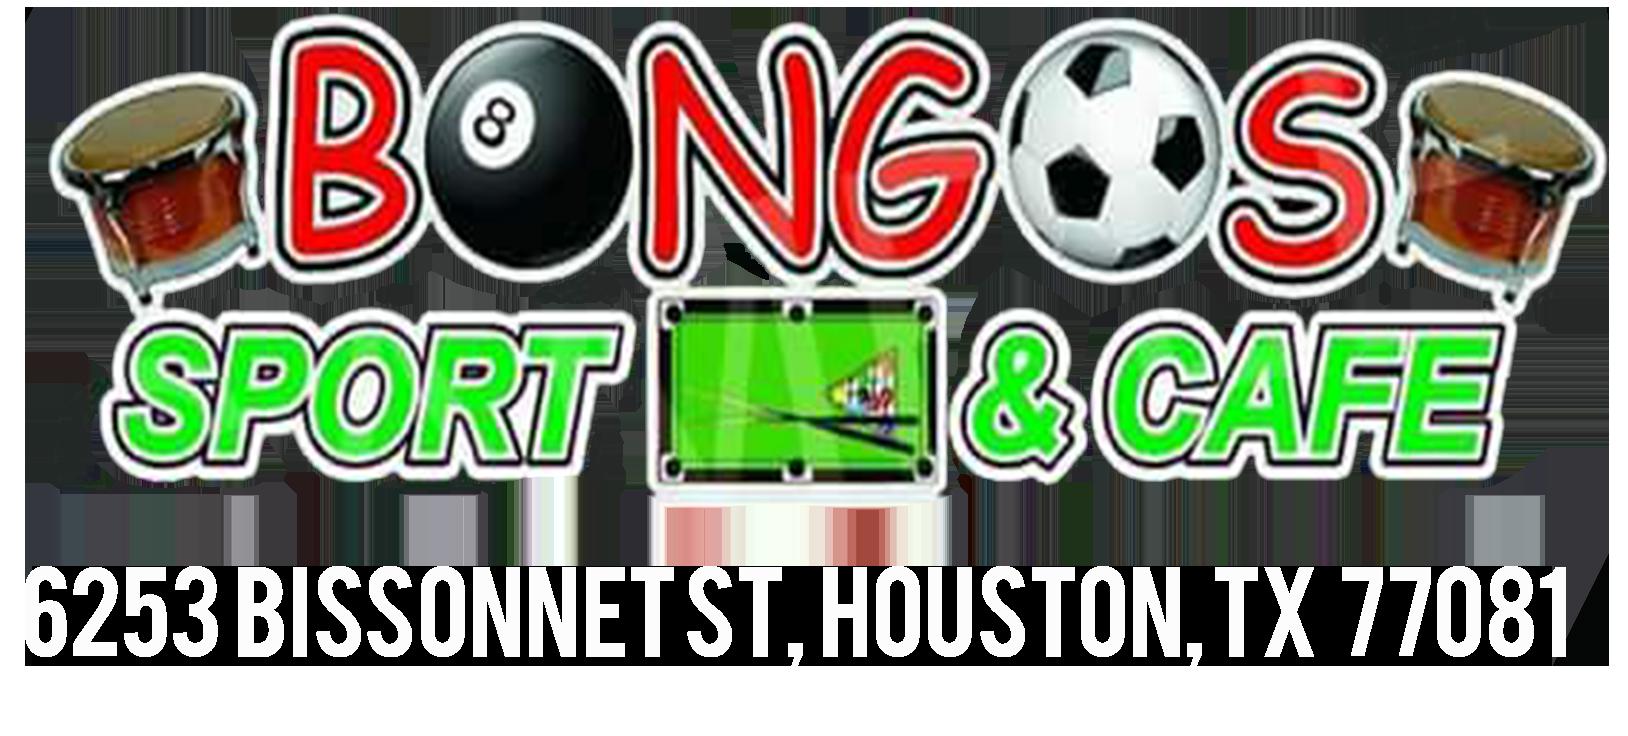 bongos logo 2